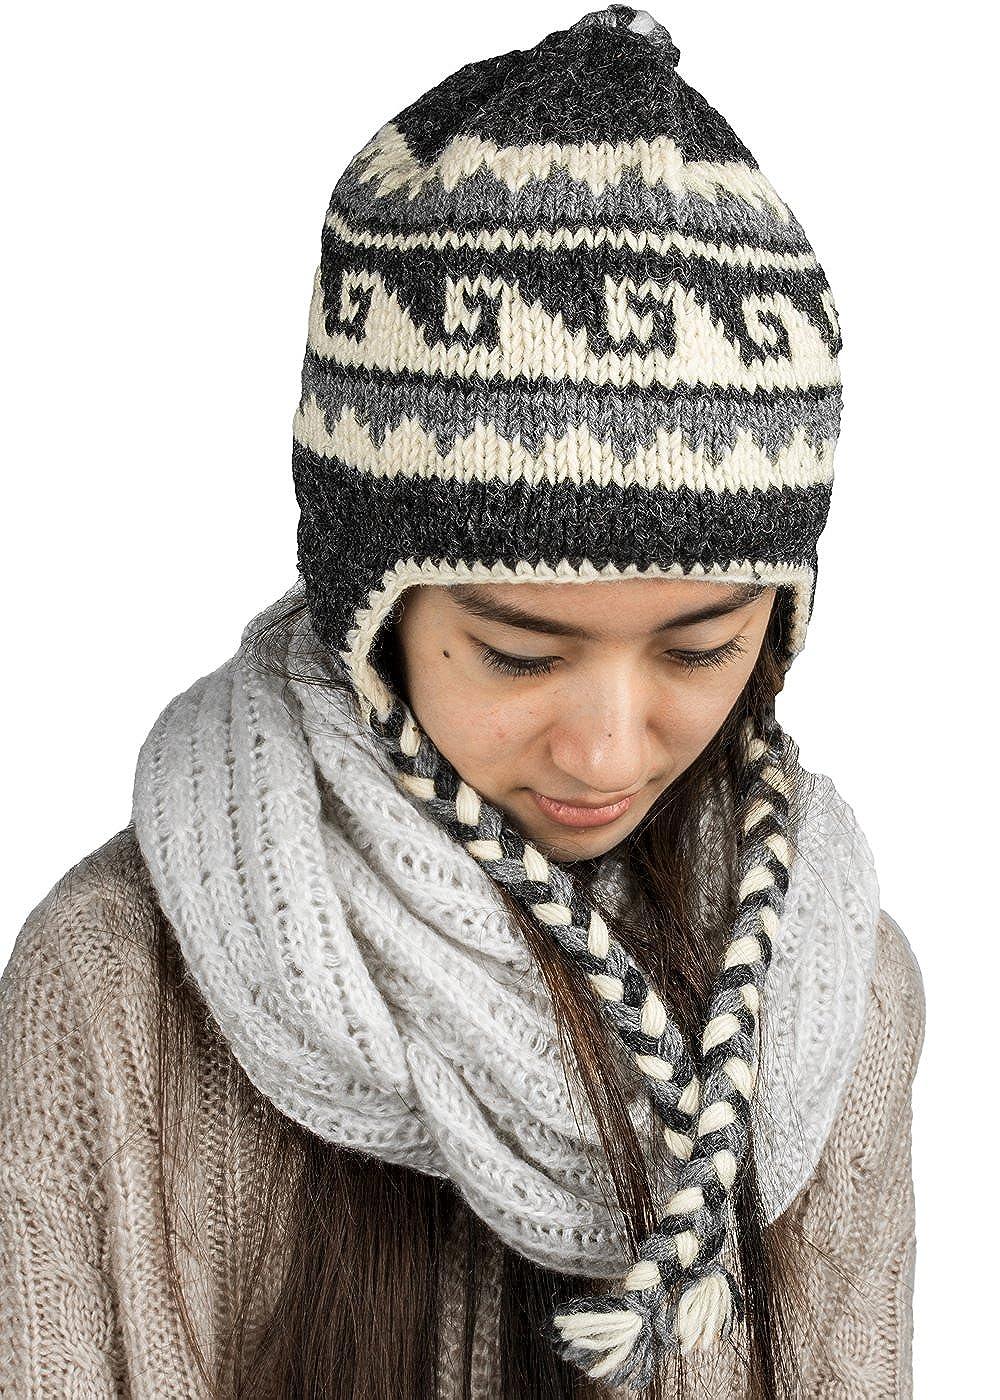 88a57937eff Tribe Azure Fair Trade Soft Warm Wool Hat Cap Winter Fleeced Inside Thick  Ear Flaps Women Fashion Grey  Amazon.ca  Clothing   Accessories